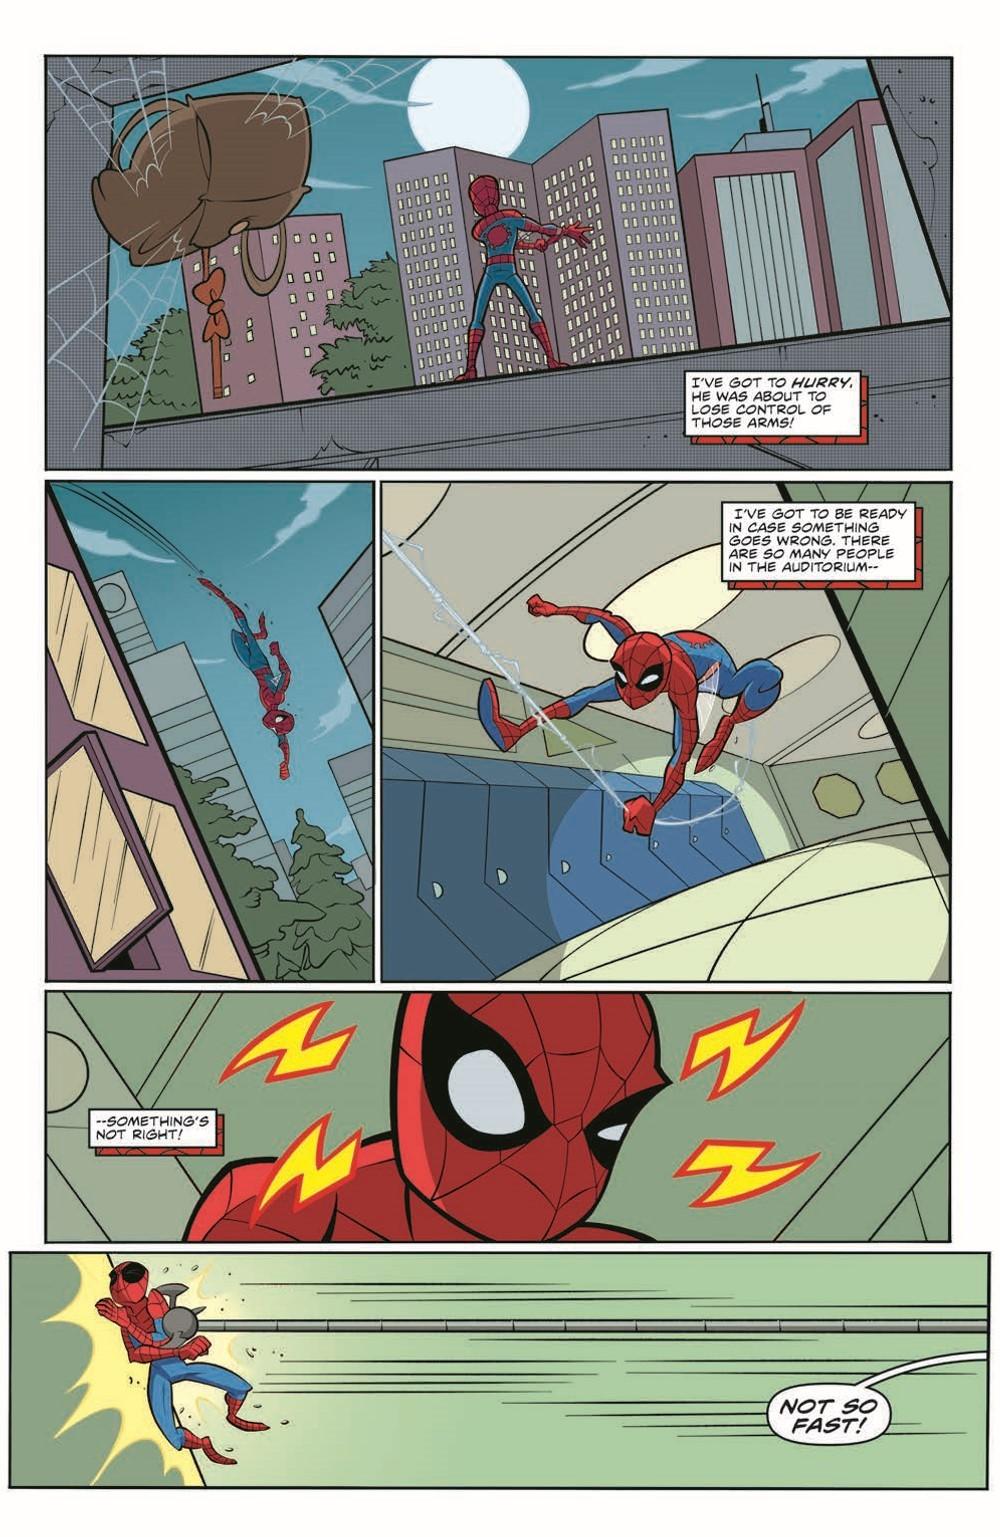 SpidermanV3-05_pr-6 ComicList Previews: MARVEL ACTION SPIDER-MAN VOLUME 3 #5